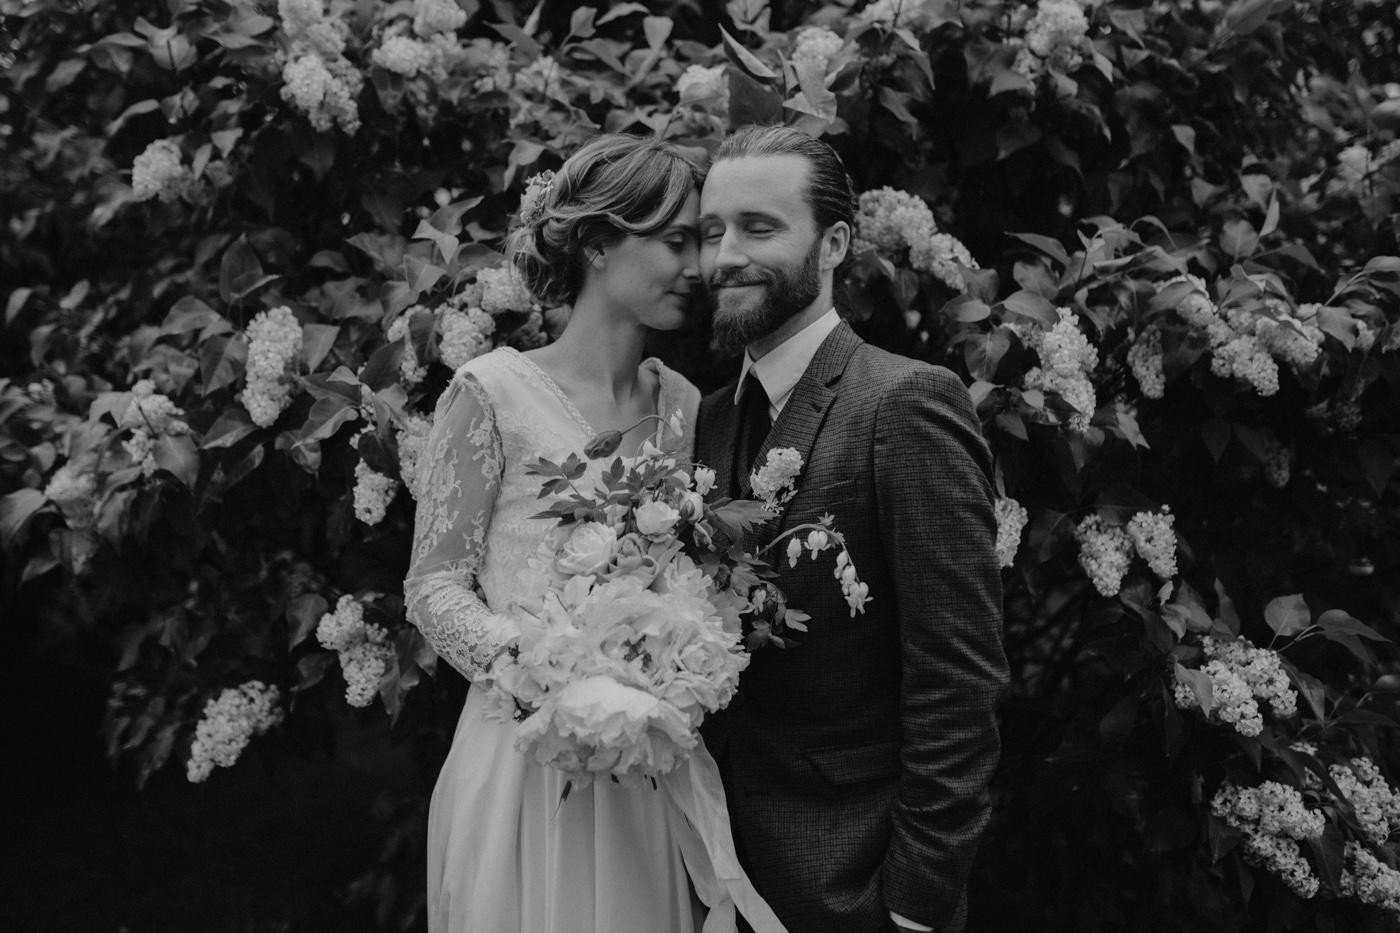 Erin-Mike-Intimate-Vintage-Wedding-Shelburne-Farms-Vermont -120.jpg